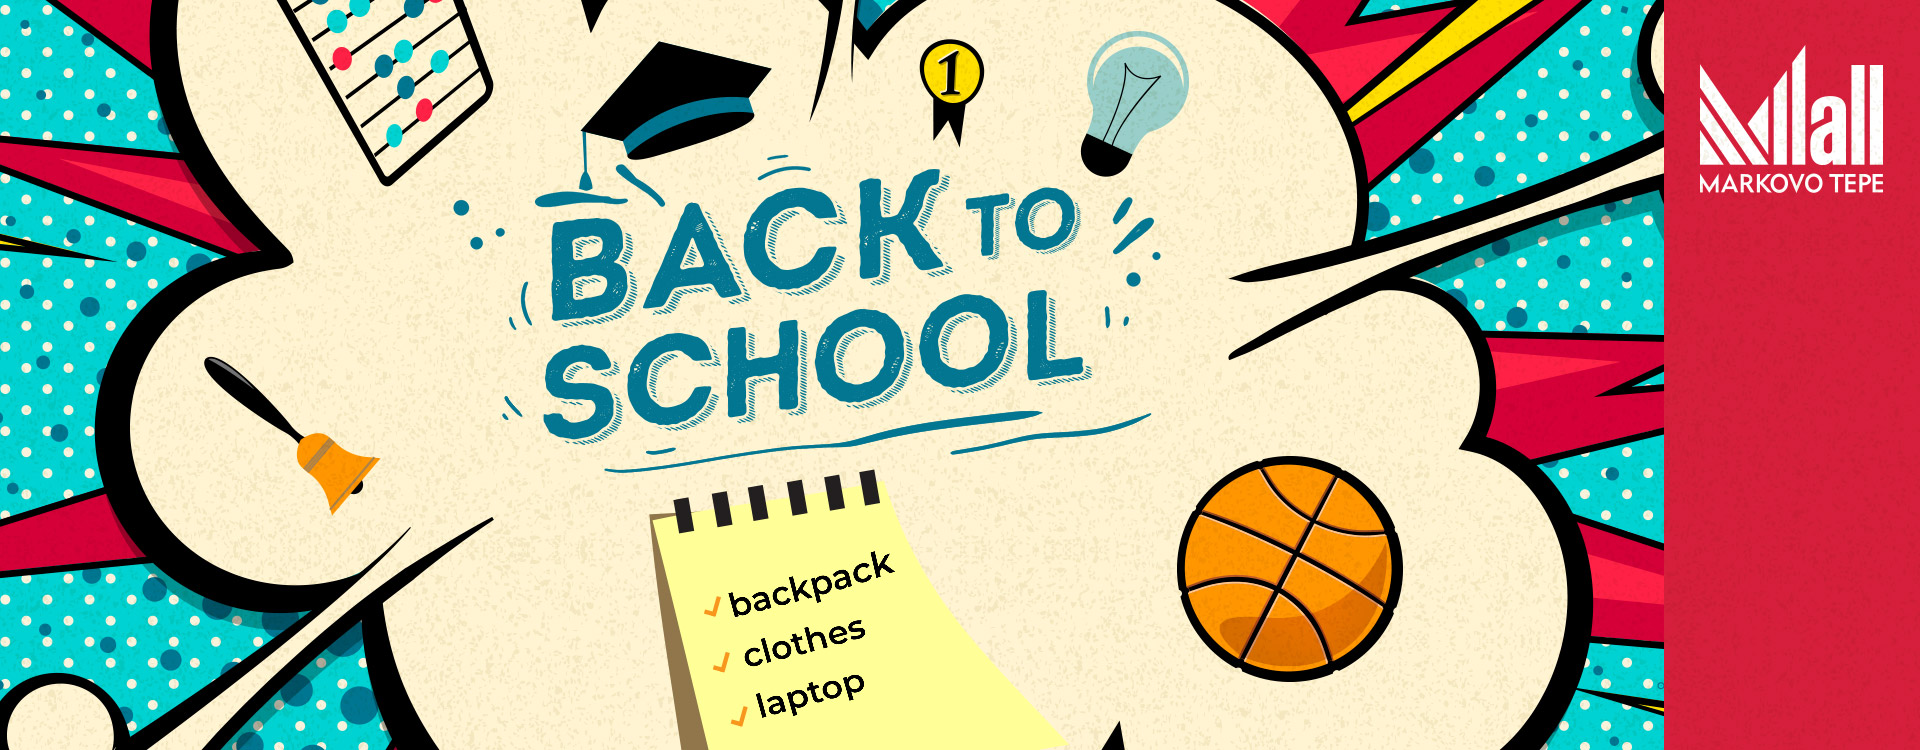 Back to school - Mall Markovo Tepe